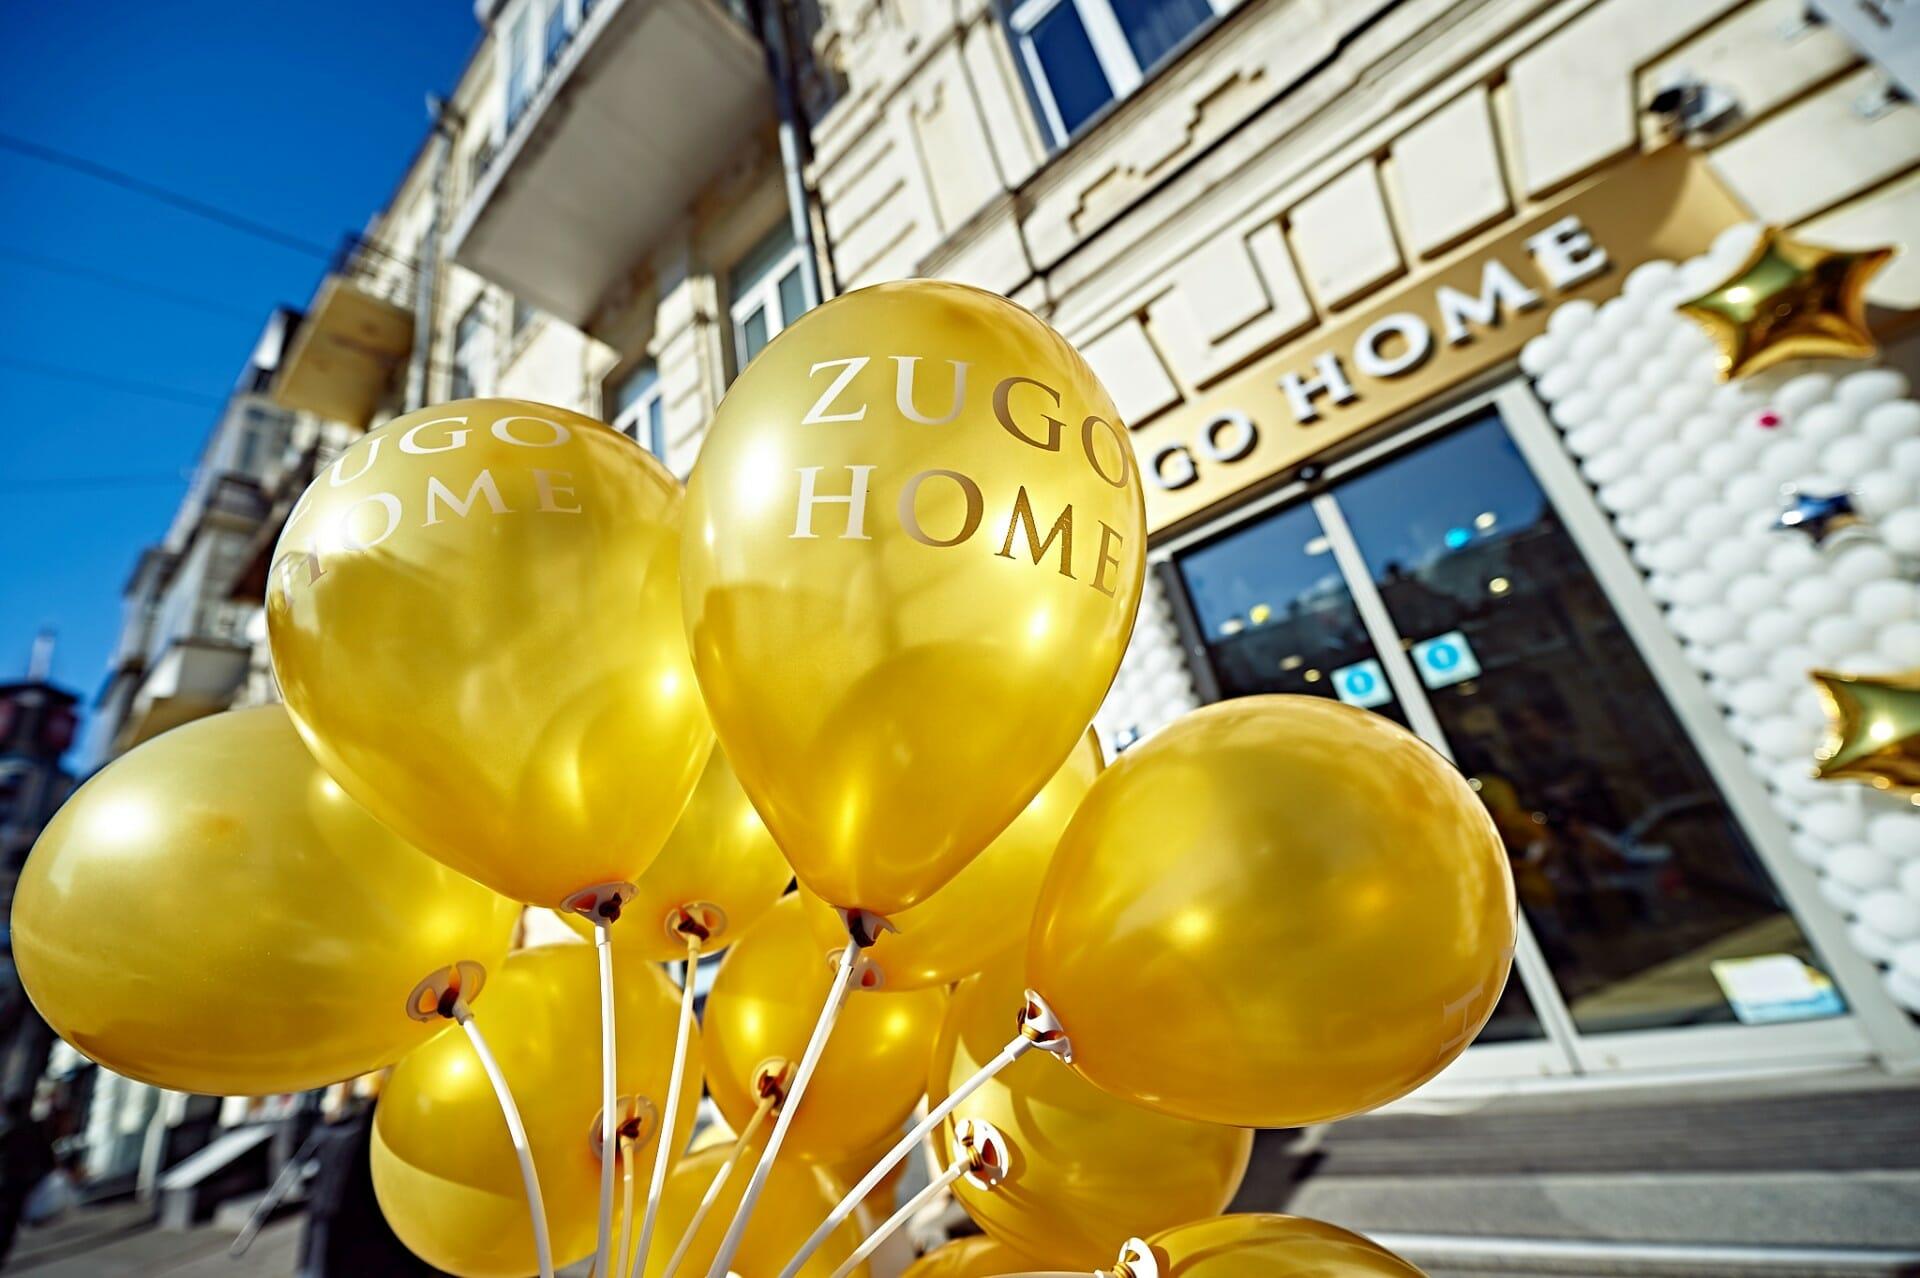 Zugo Home был открыт в Киеве